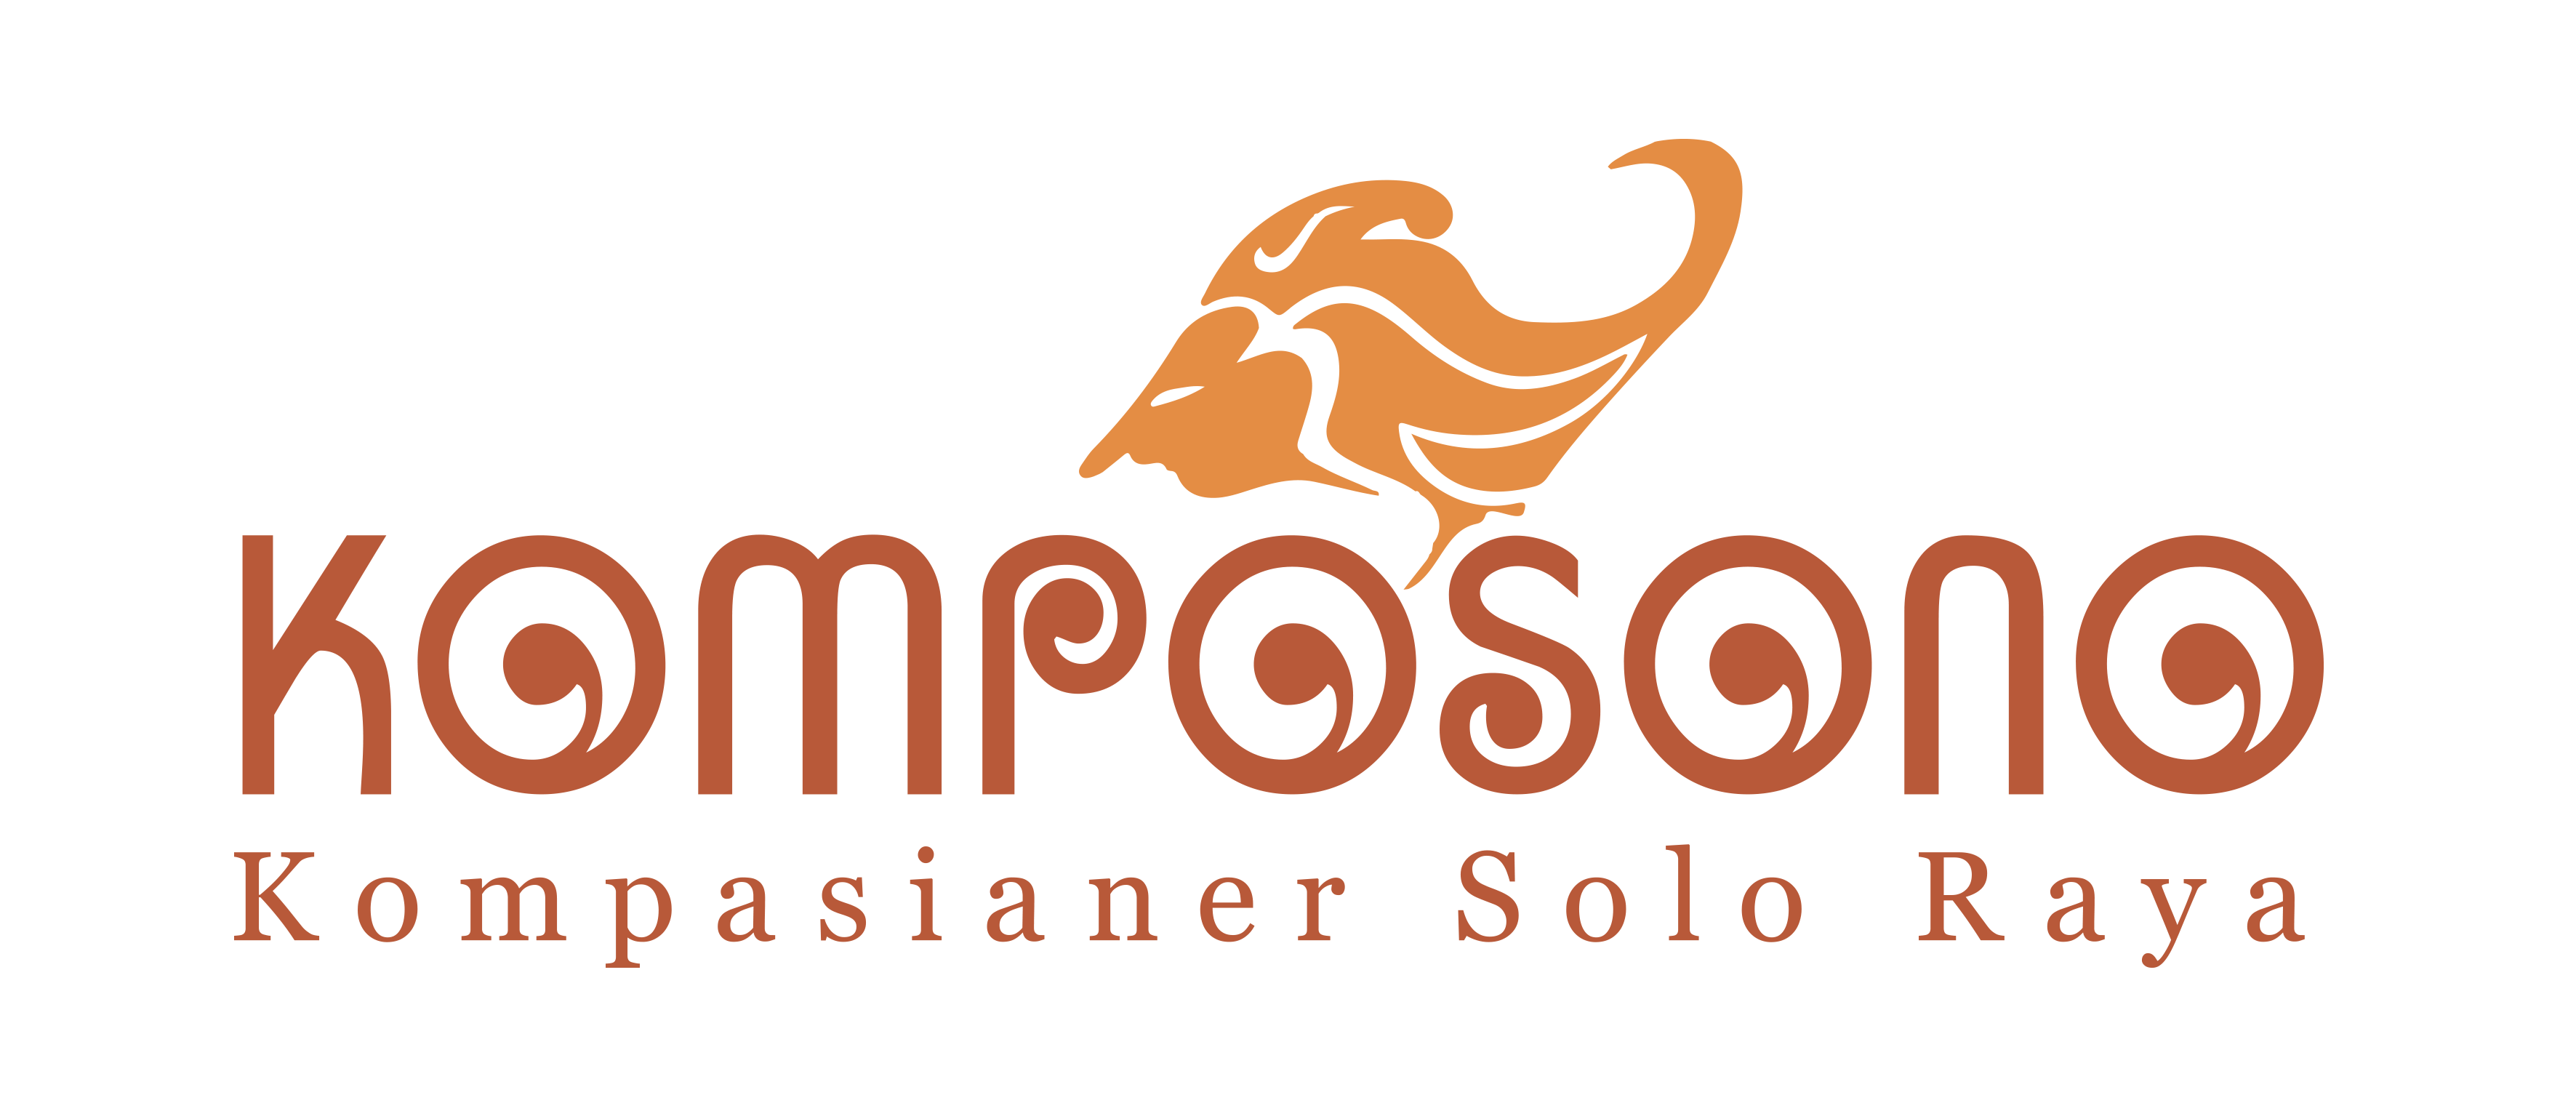 items/kaleidoskop_2019/24-komposono-1577688590.png